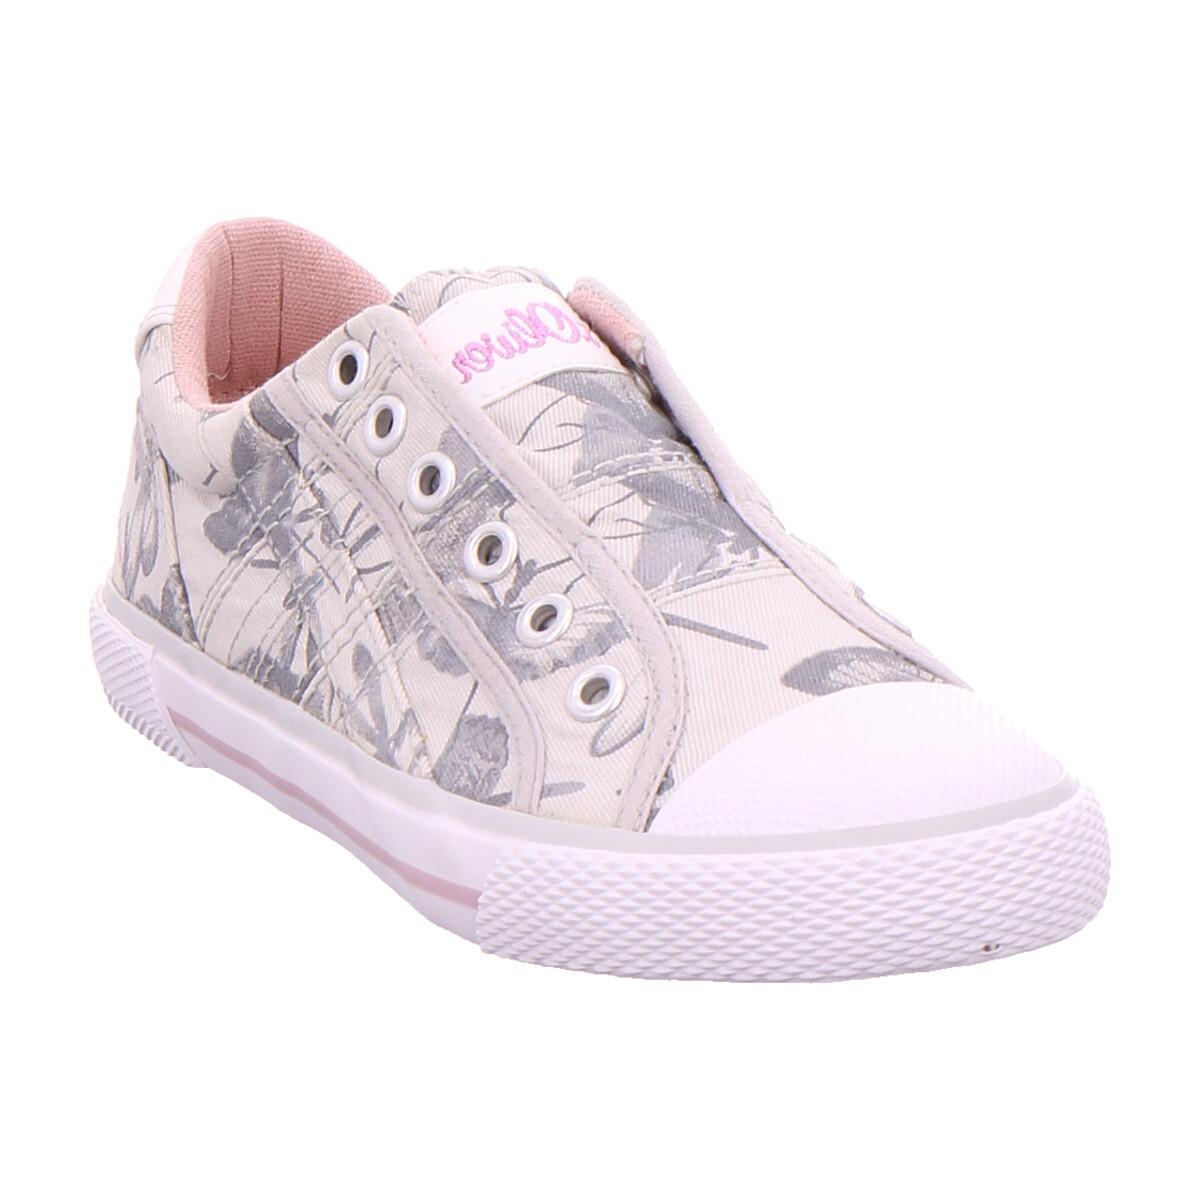 SOliver Ki-Slipper GREY FLOWER 204 - Schuhe Sneaker Low  39,95 €